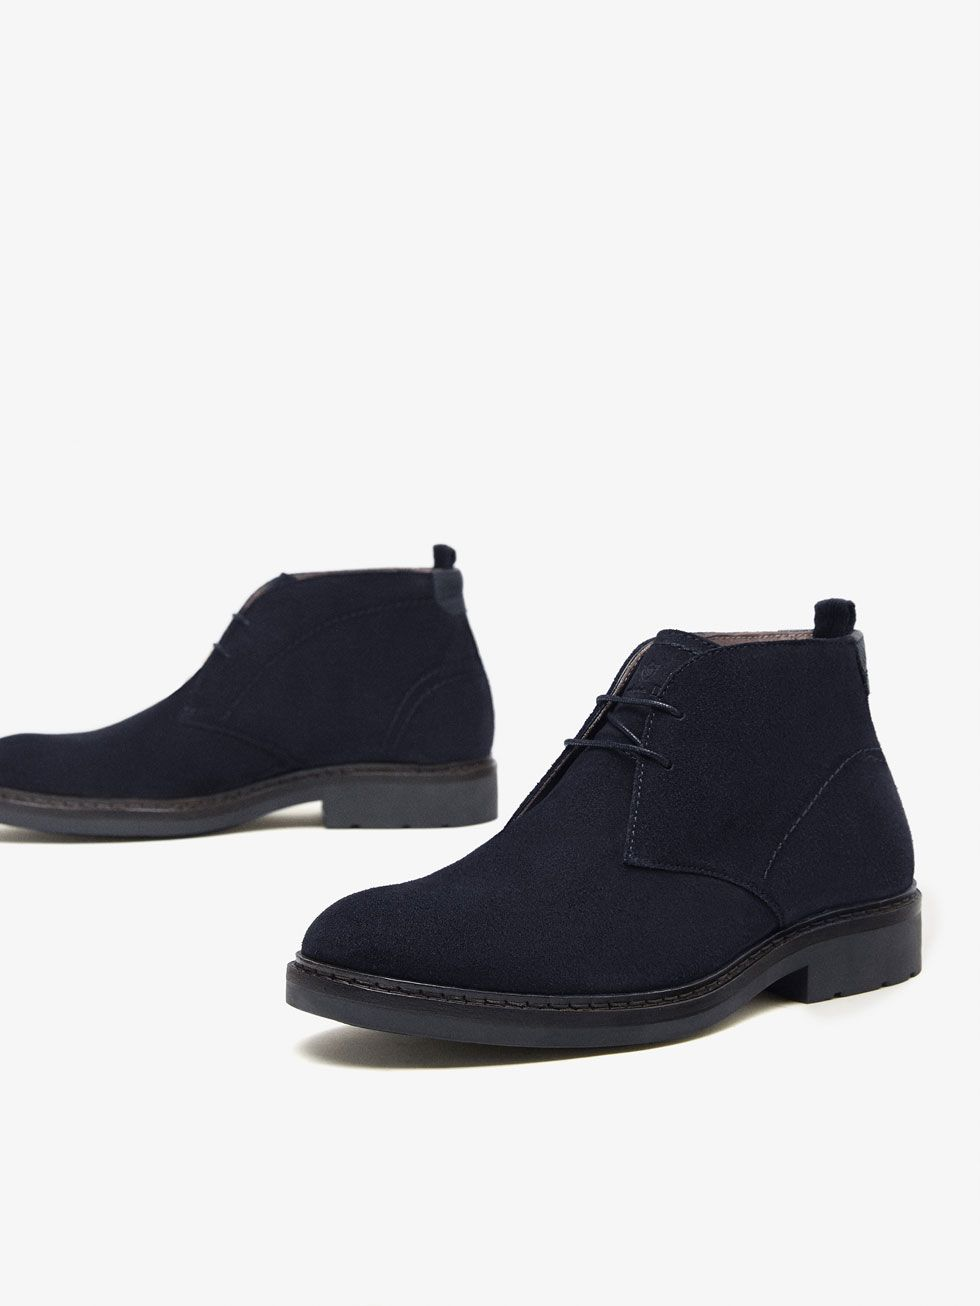 BOTIN PIEL SERRAJE AZUL de HOMBRE - Zapatos - Ver todo de Massimo Dutti de  Otoño Invierno 2017 por 89.95. ¡Elegancia natural! 781c70b916b